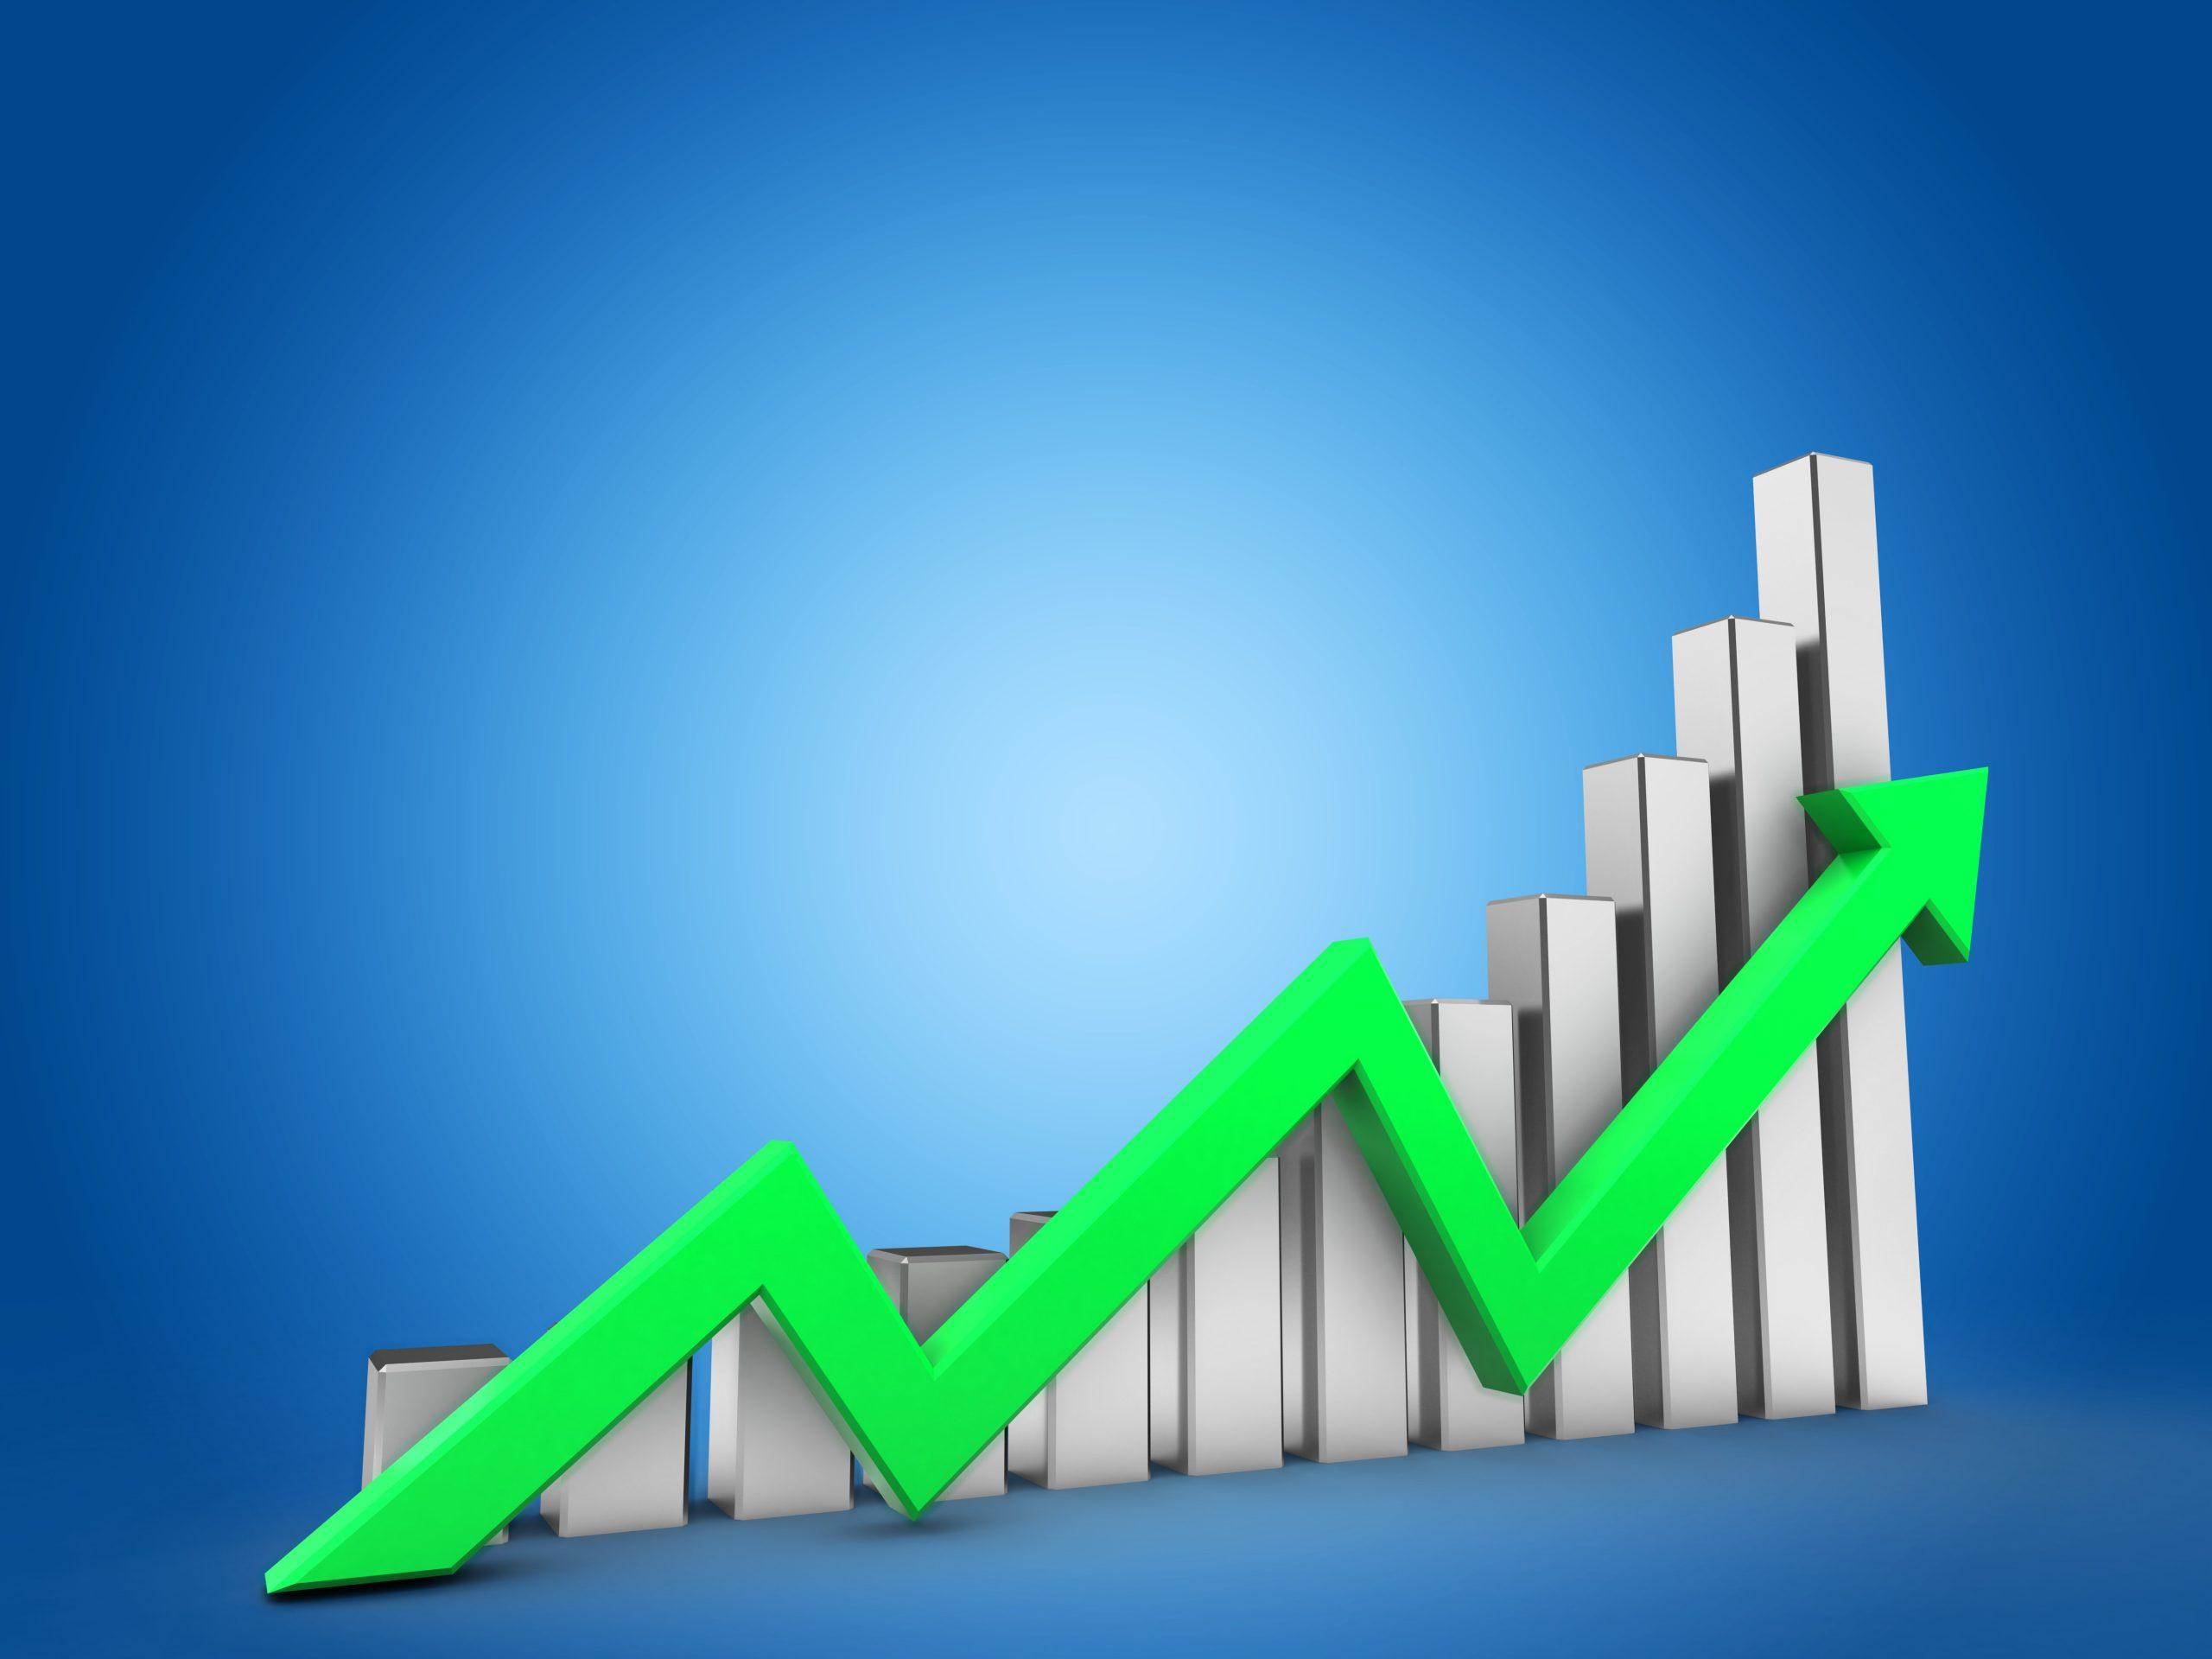 https://depositphotos.com/130100472/stock-photo-steel-charts-with-green-arrow.html